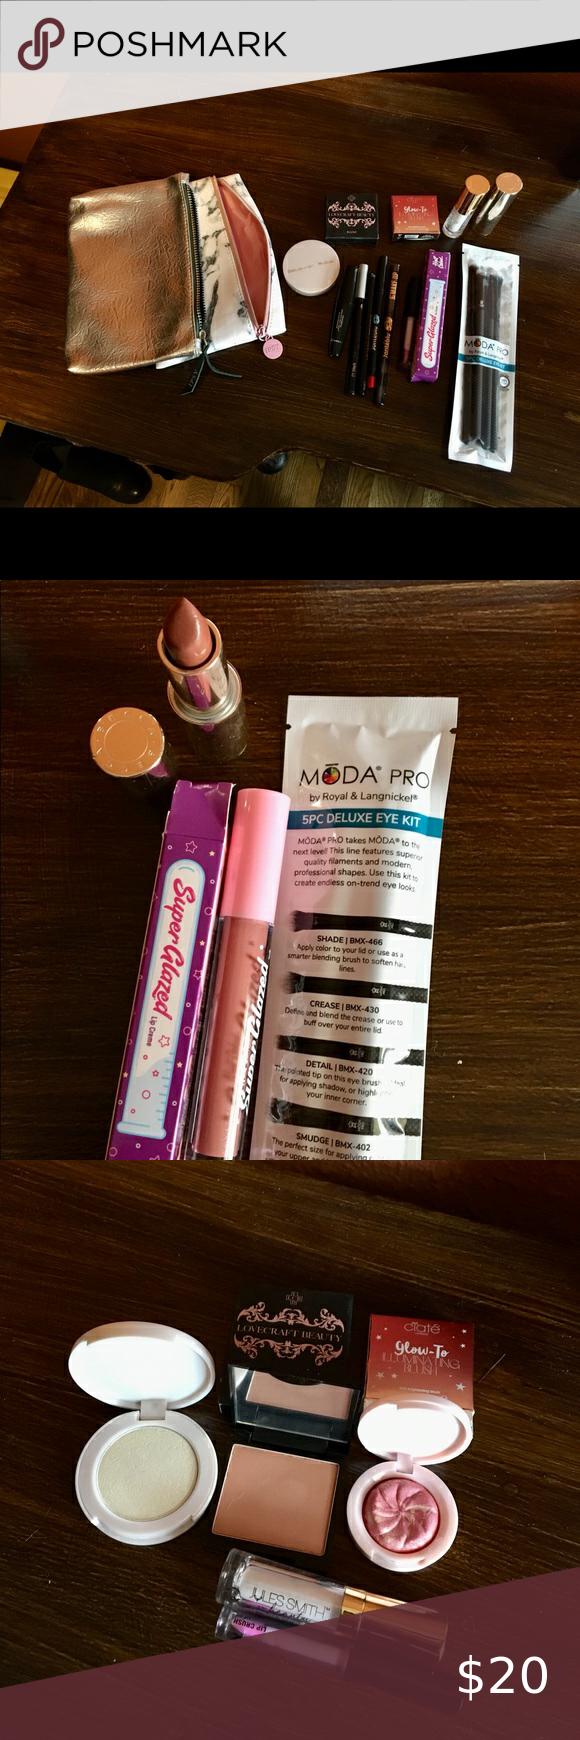 IPSY/Boxycharm Makeup Bundle in 2020 Makeup bundles